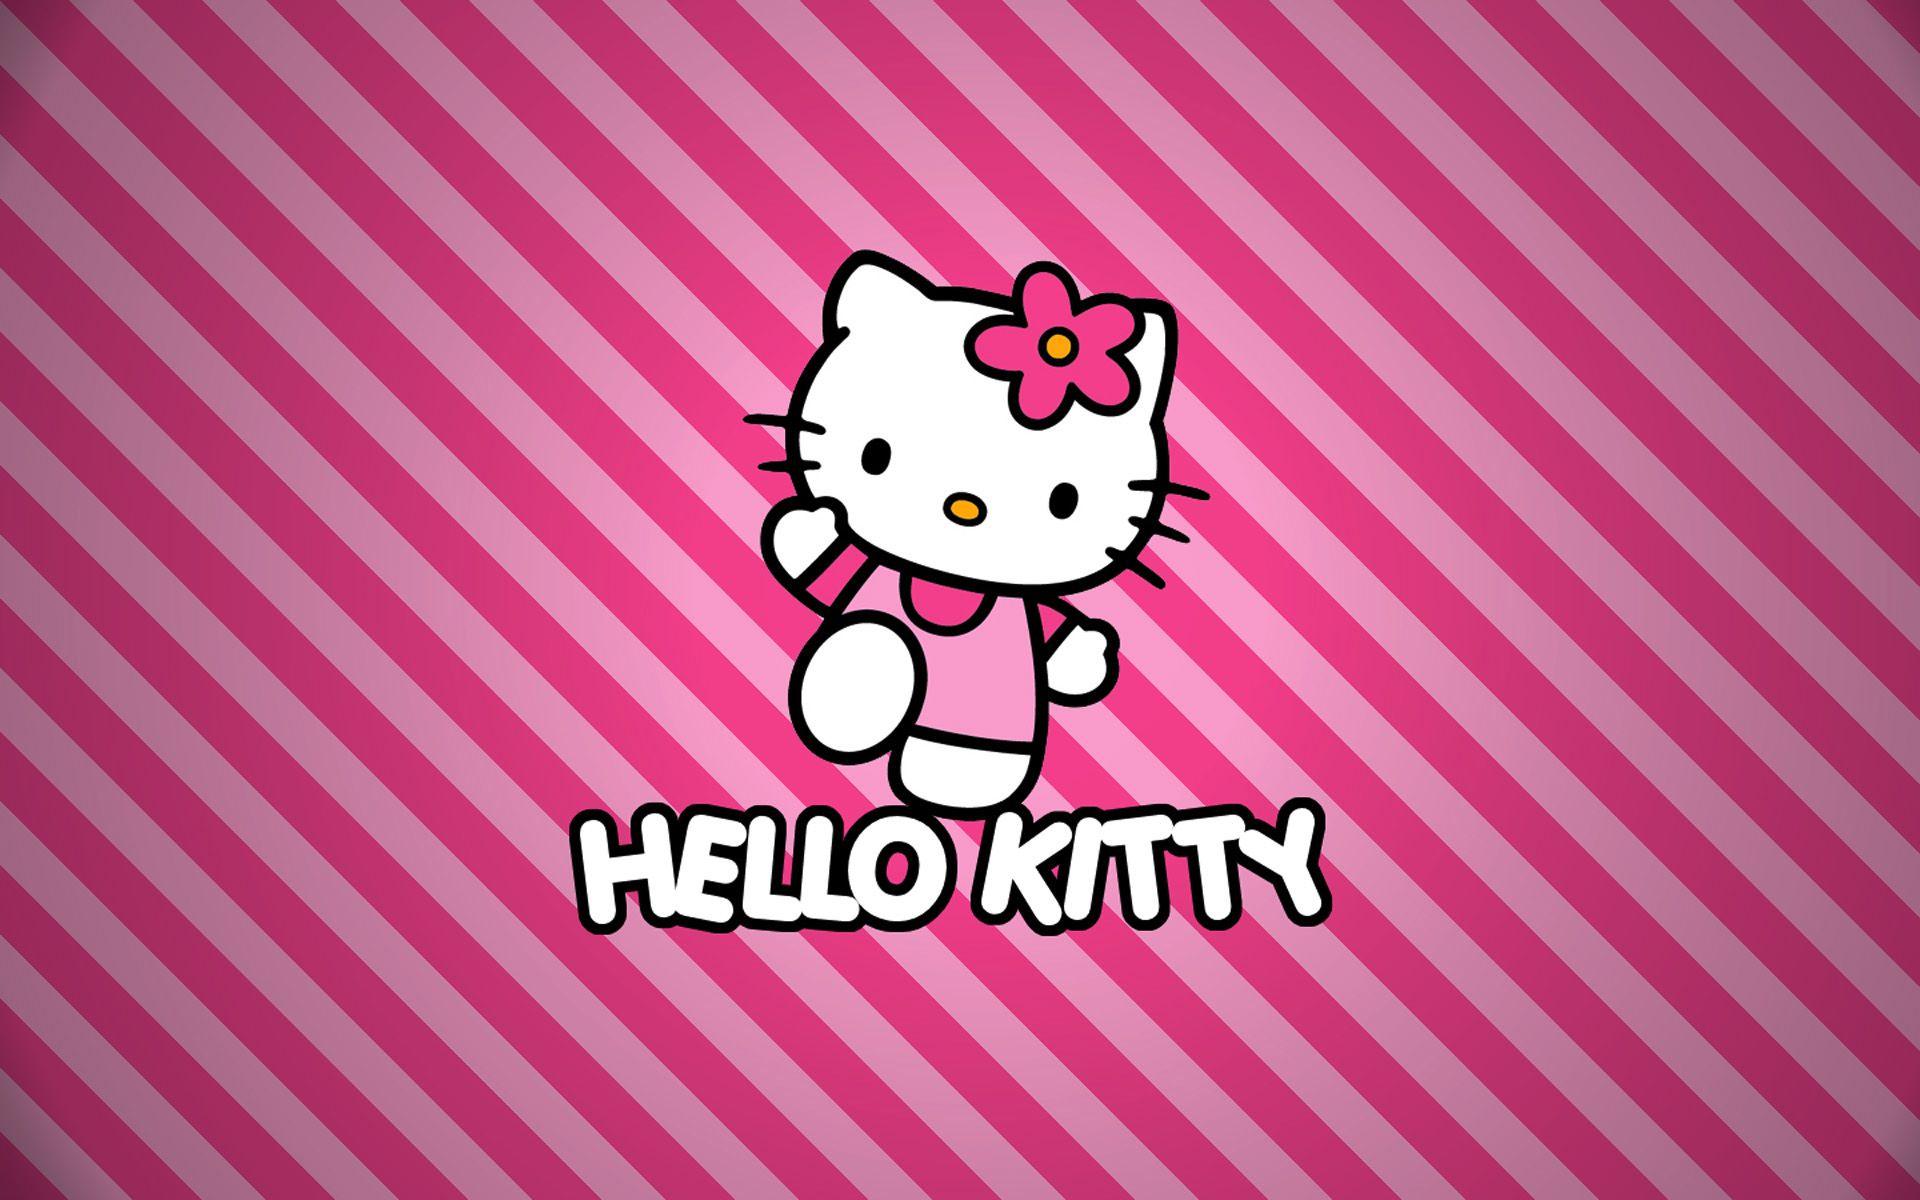 Must see Wallpaper Hello Kitty Pattern - 3c2040e4ec9b2336b21ba4a43904a6d3  Collection_279570.jpg